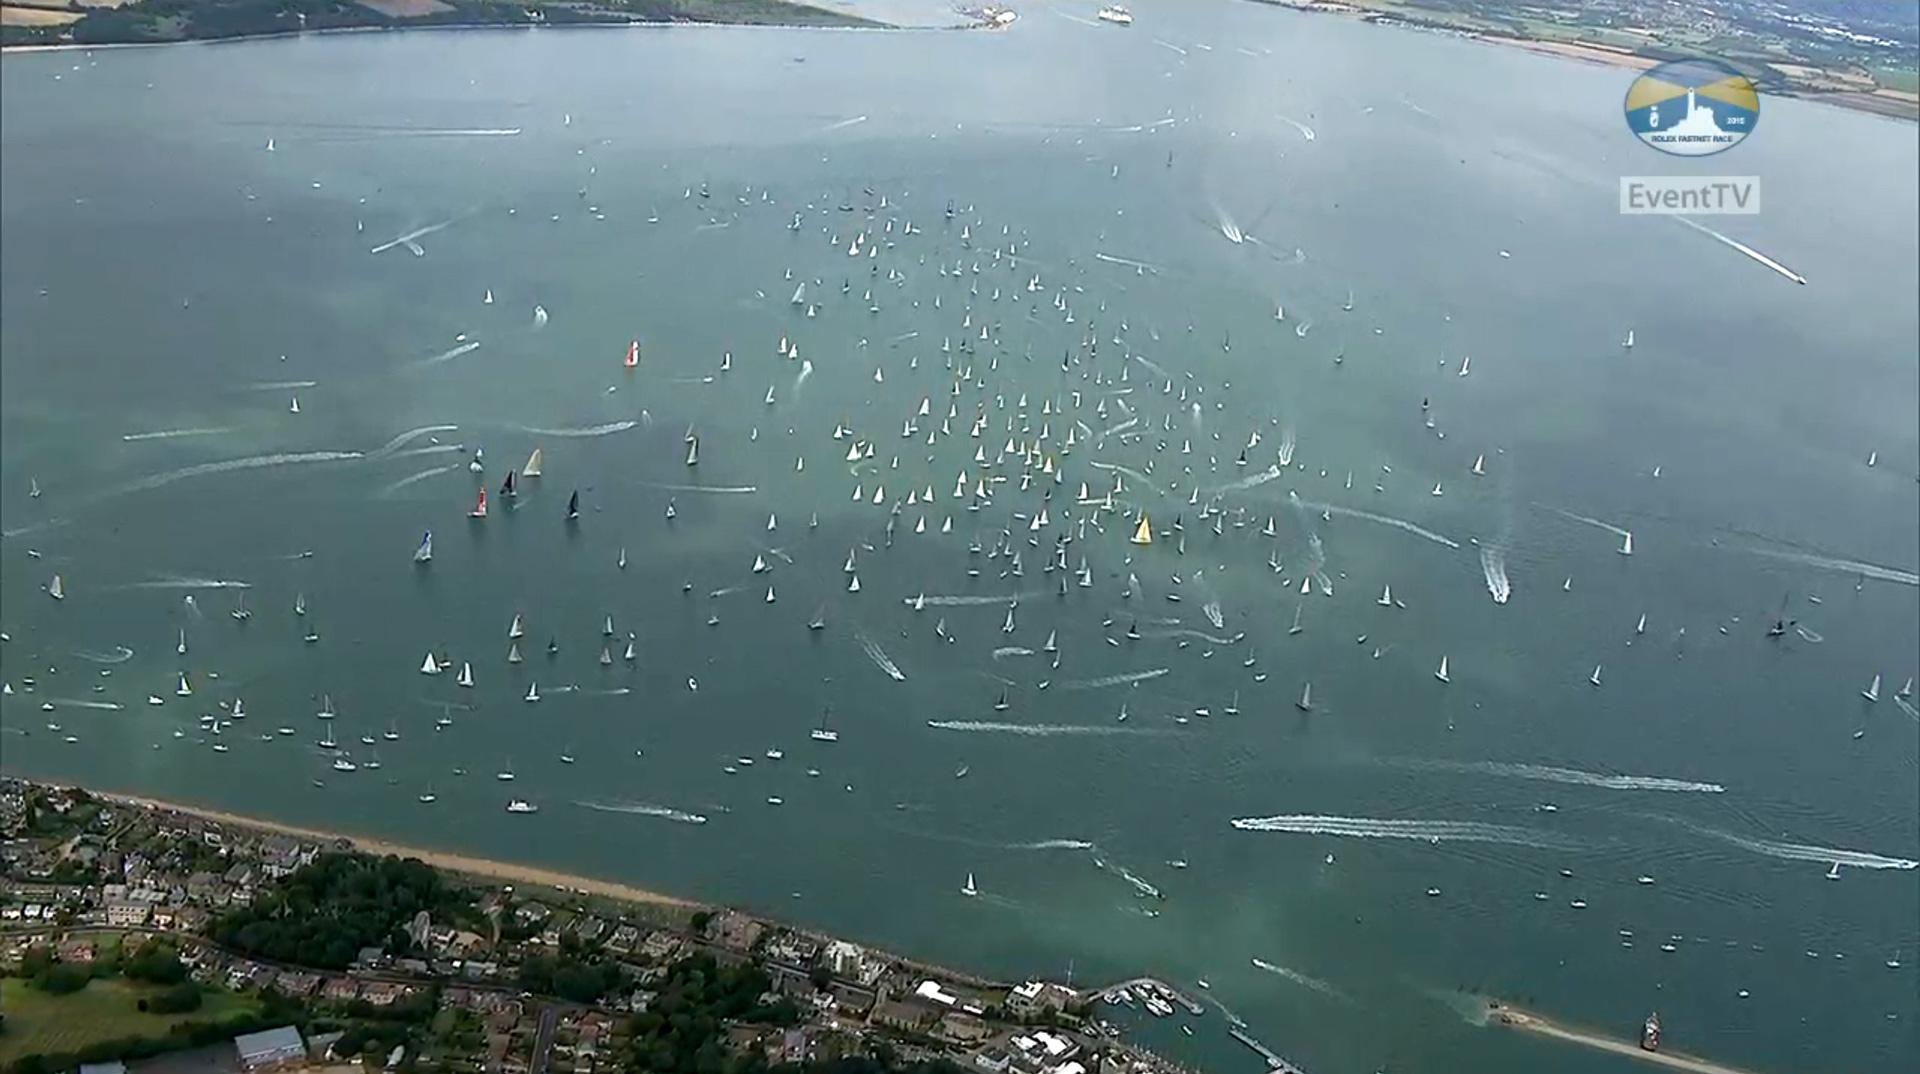 Fastnet Race 2015 Start